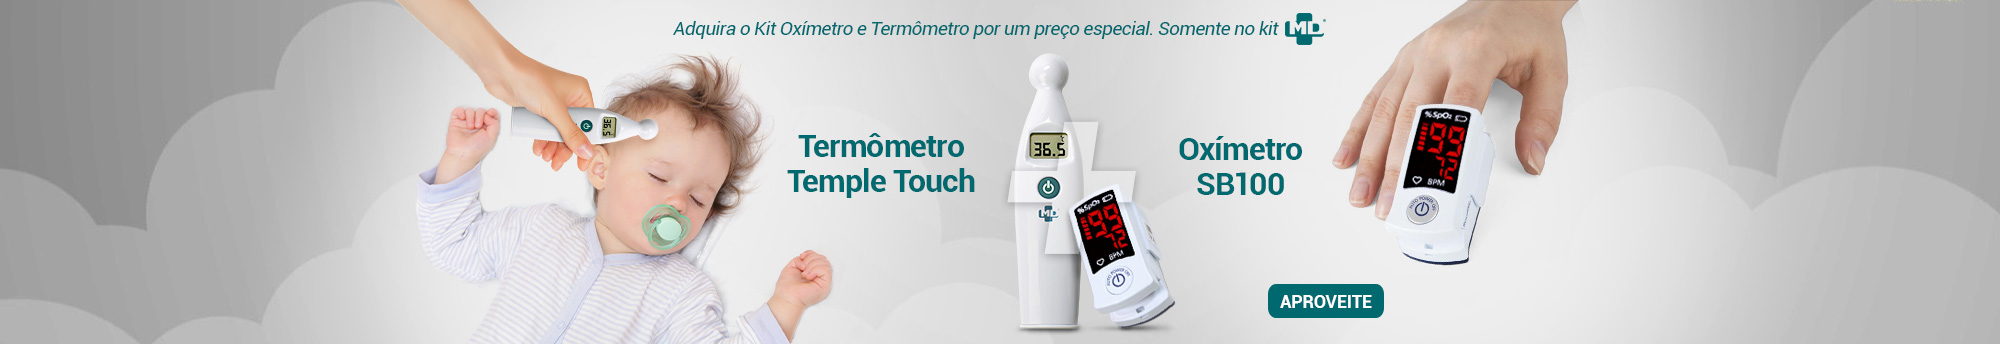 Banner Home Termômetro Temple Touch